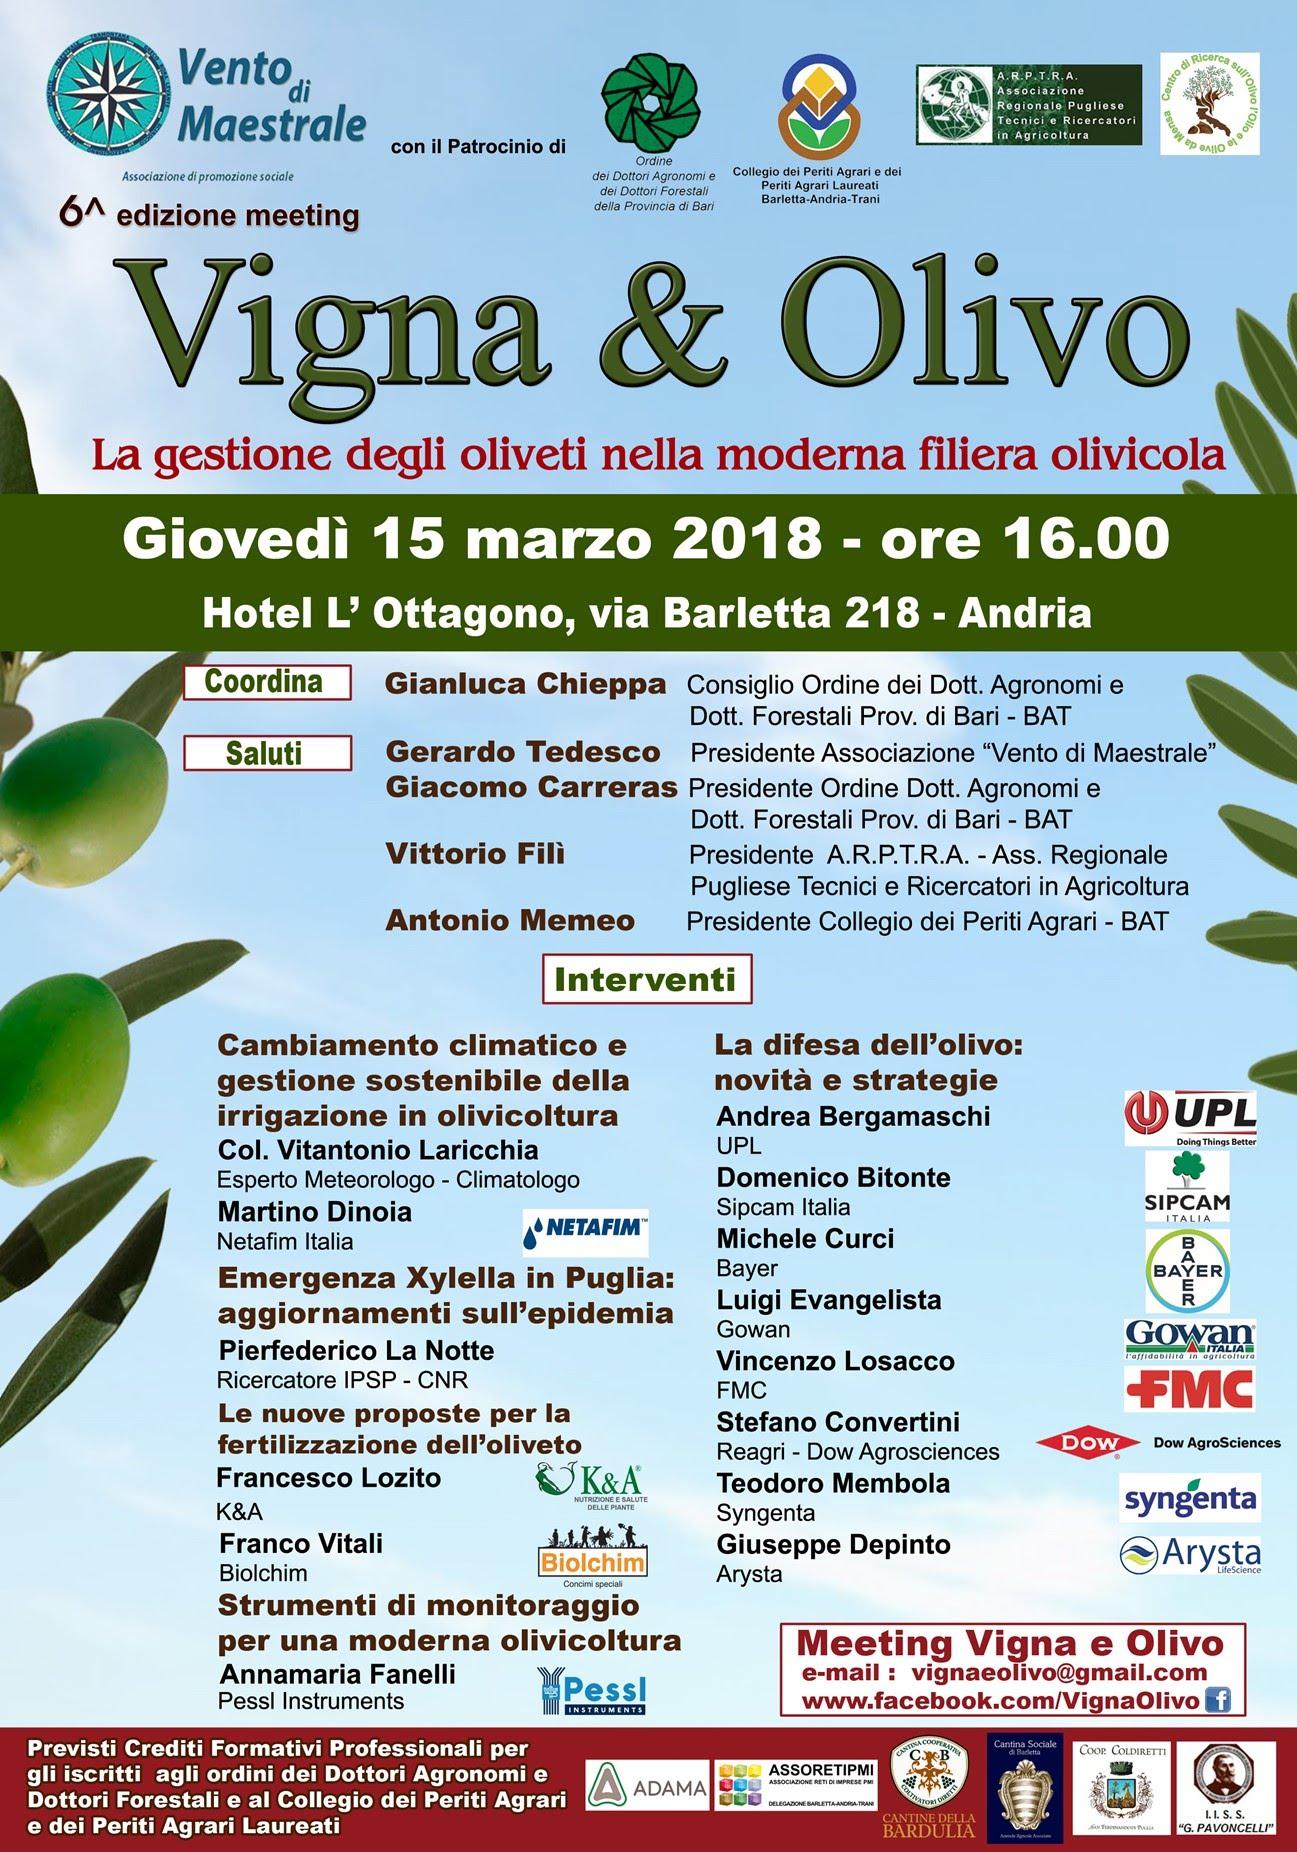 Vigna & Olivo Andria 2018